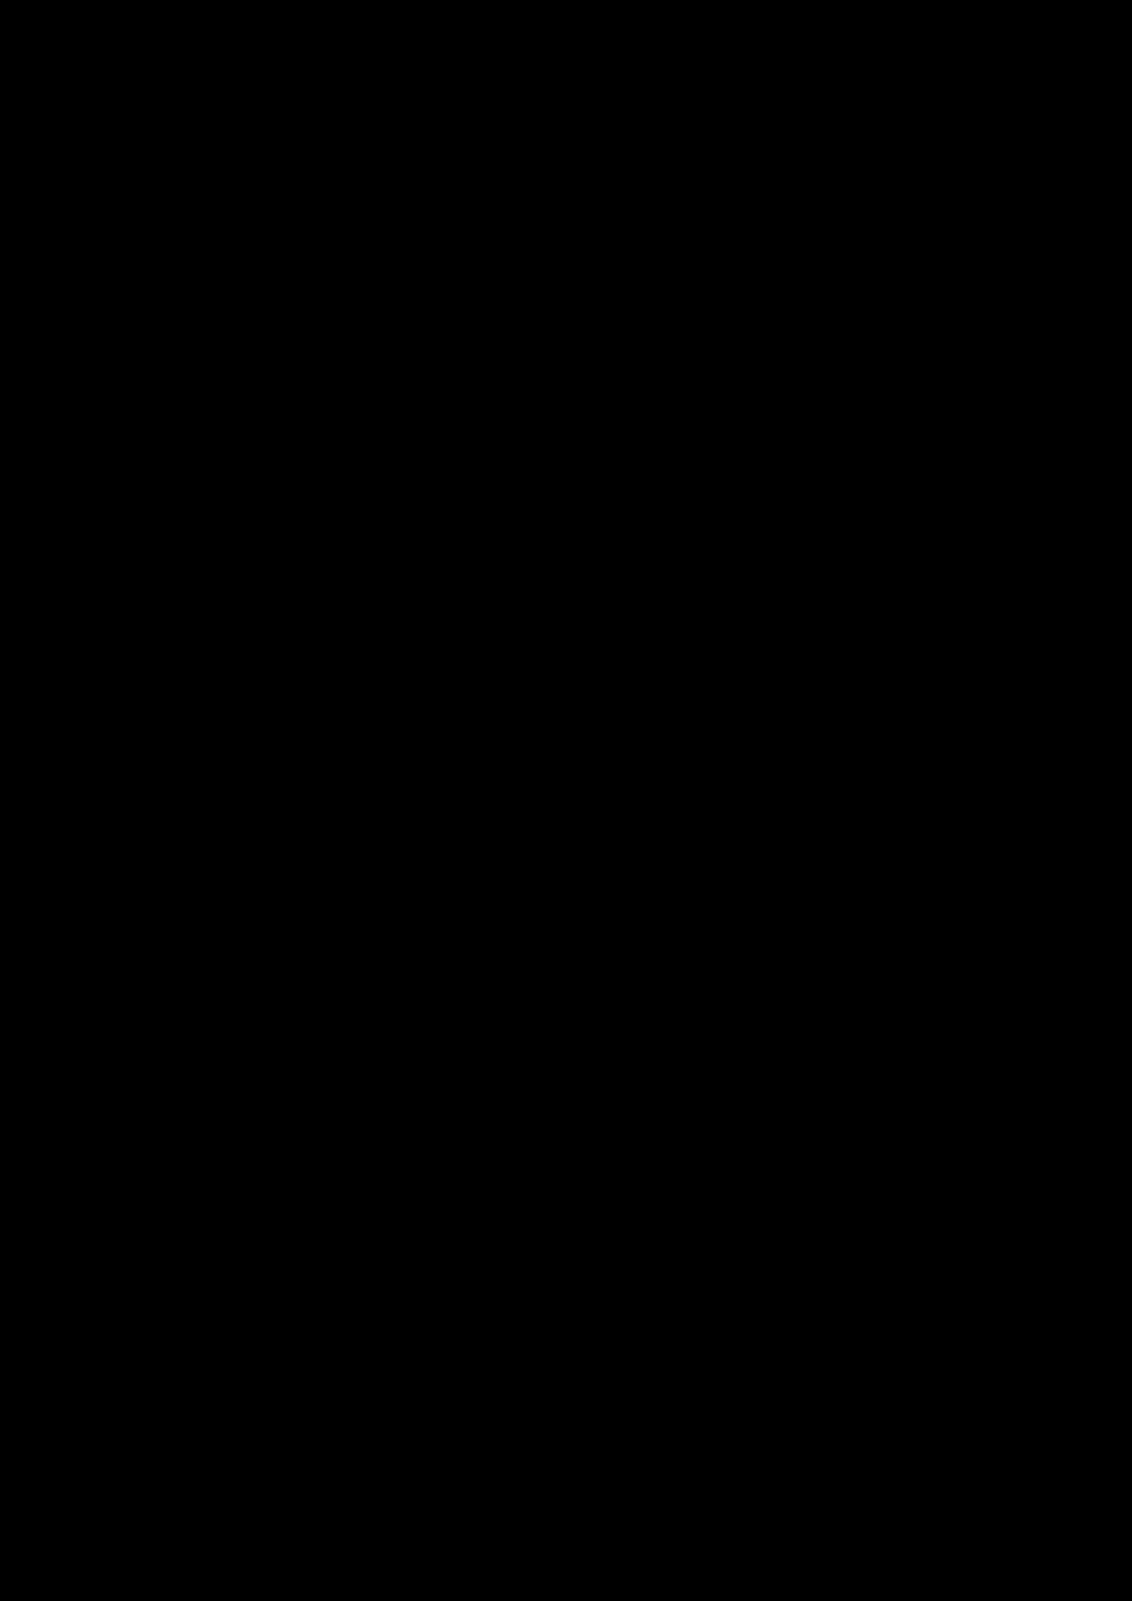 Korolevstvo slez slide, Image 11